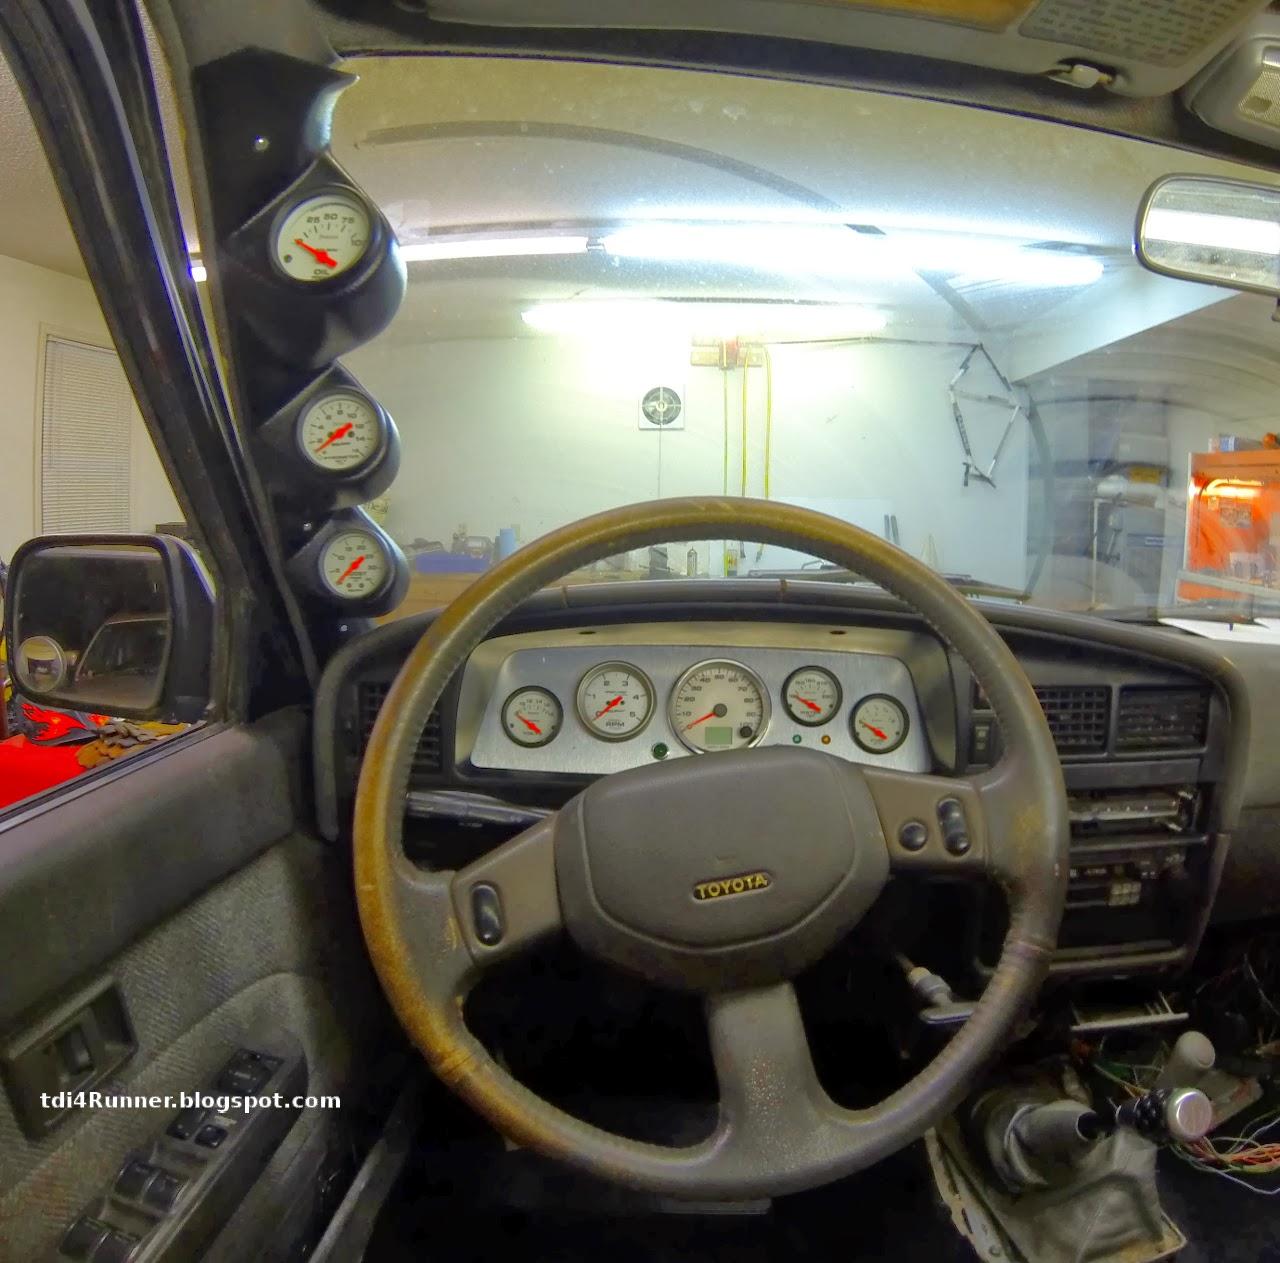 Toyota TDI 4Runner Project - Diesel Conversion